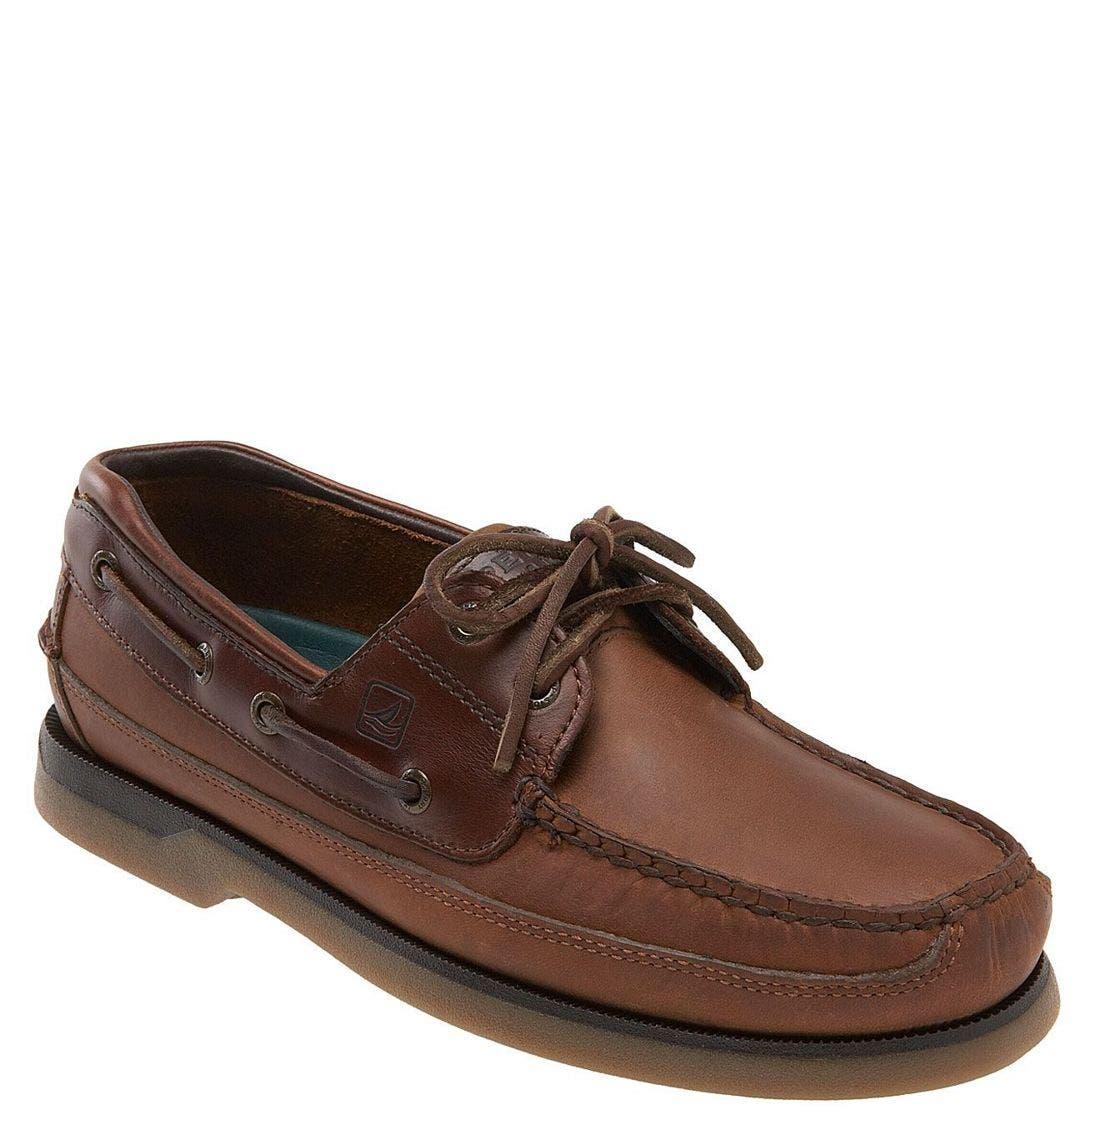 Top-Sider<sup>®</sup> 'Mako Two-Eye Canoe Moc' Boat Shoe,                             Main thumbnail 1, color,                             COP